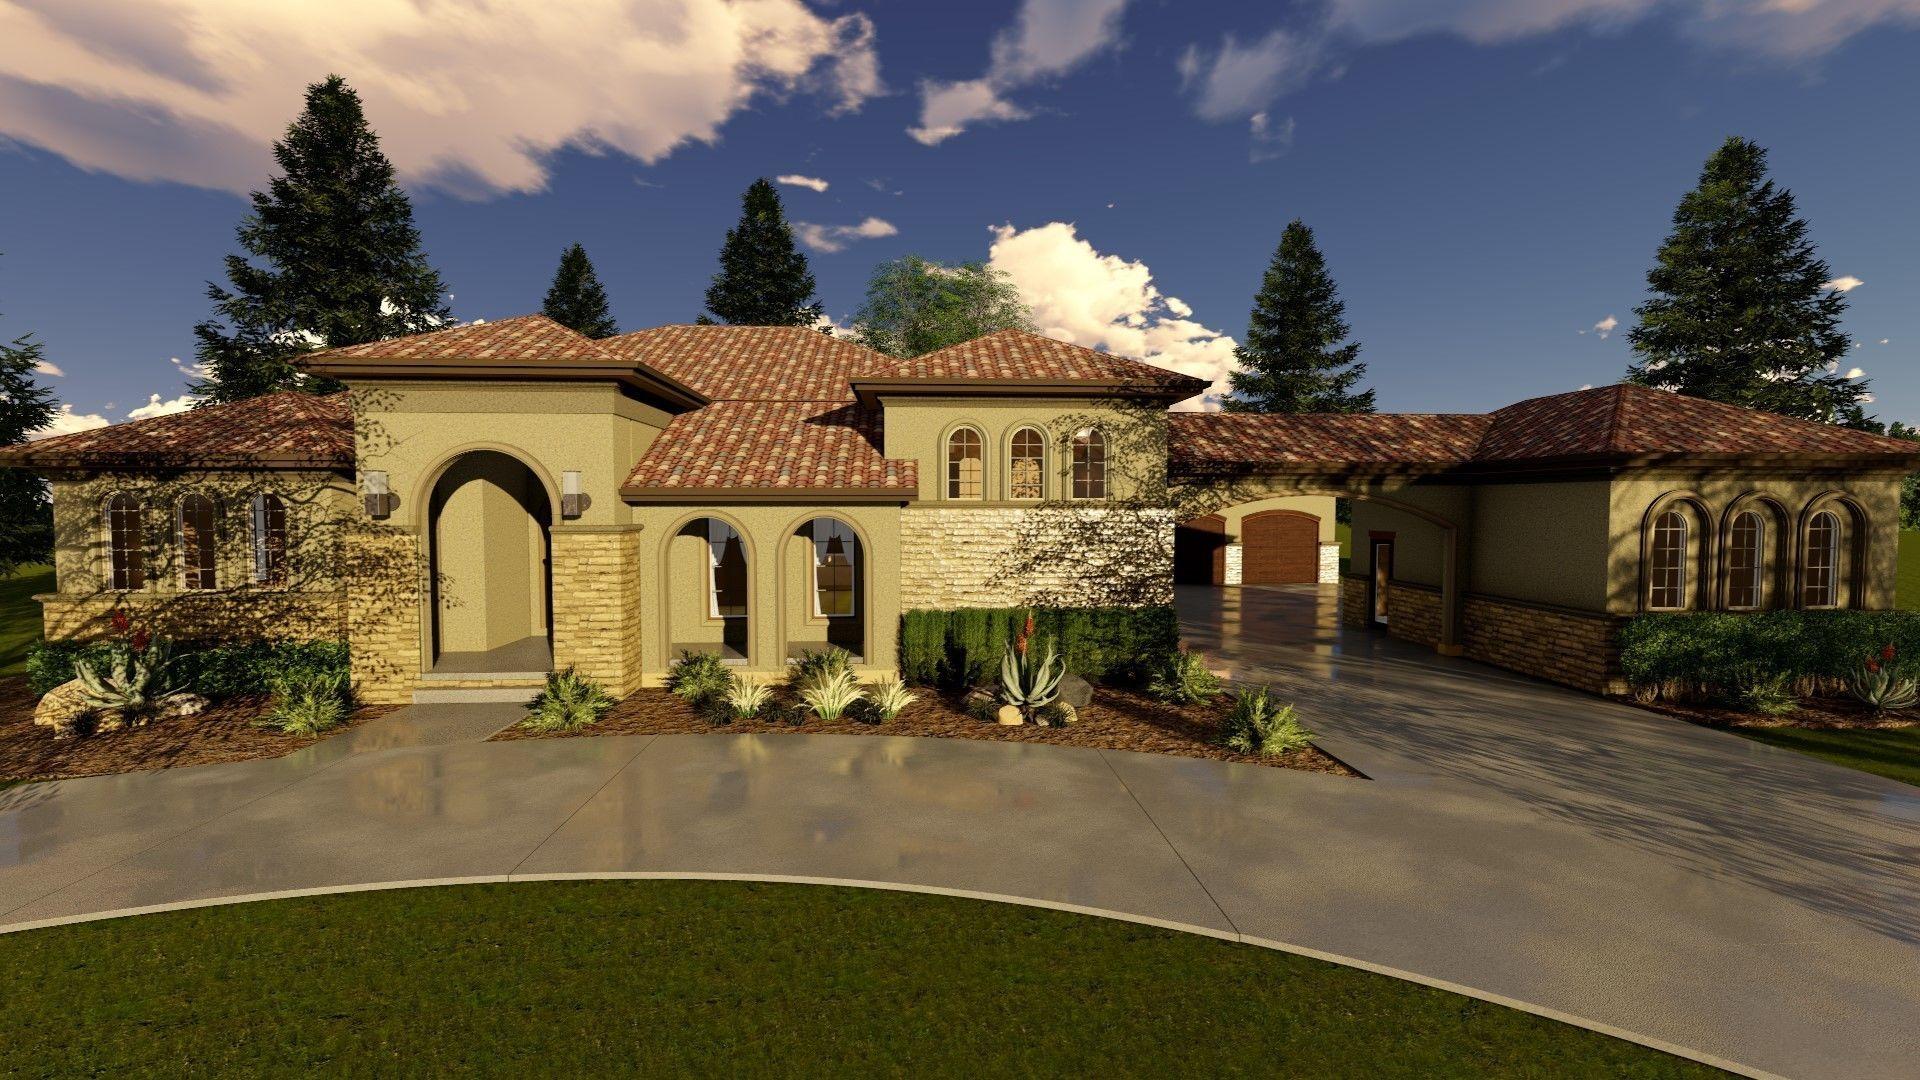 1 Story Mediterranean House Plan Lamplighter Mediterranean Homes Spanish Style Homes Mediterranean Homes Exterior